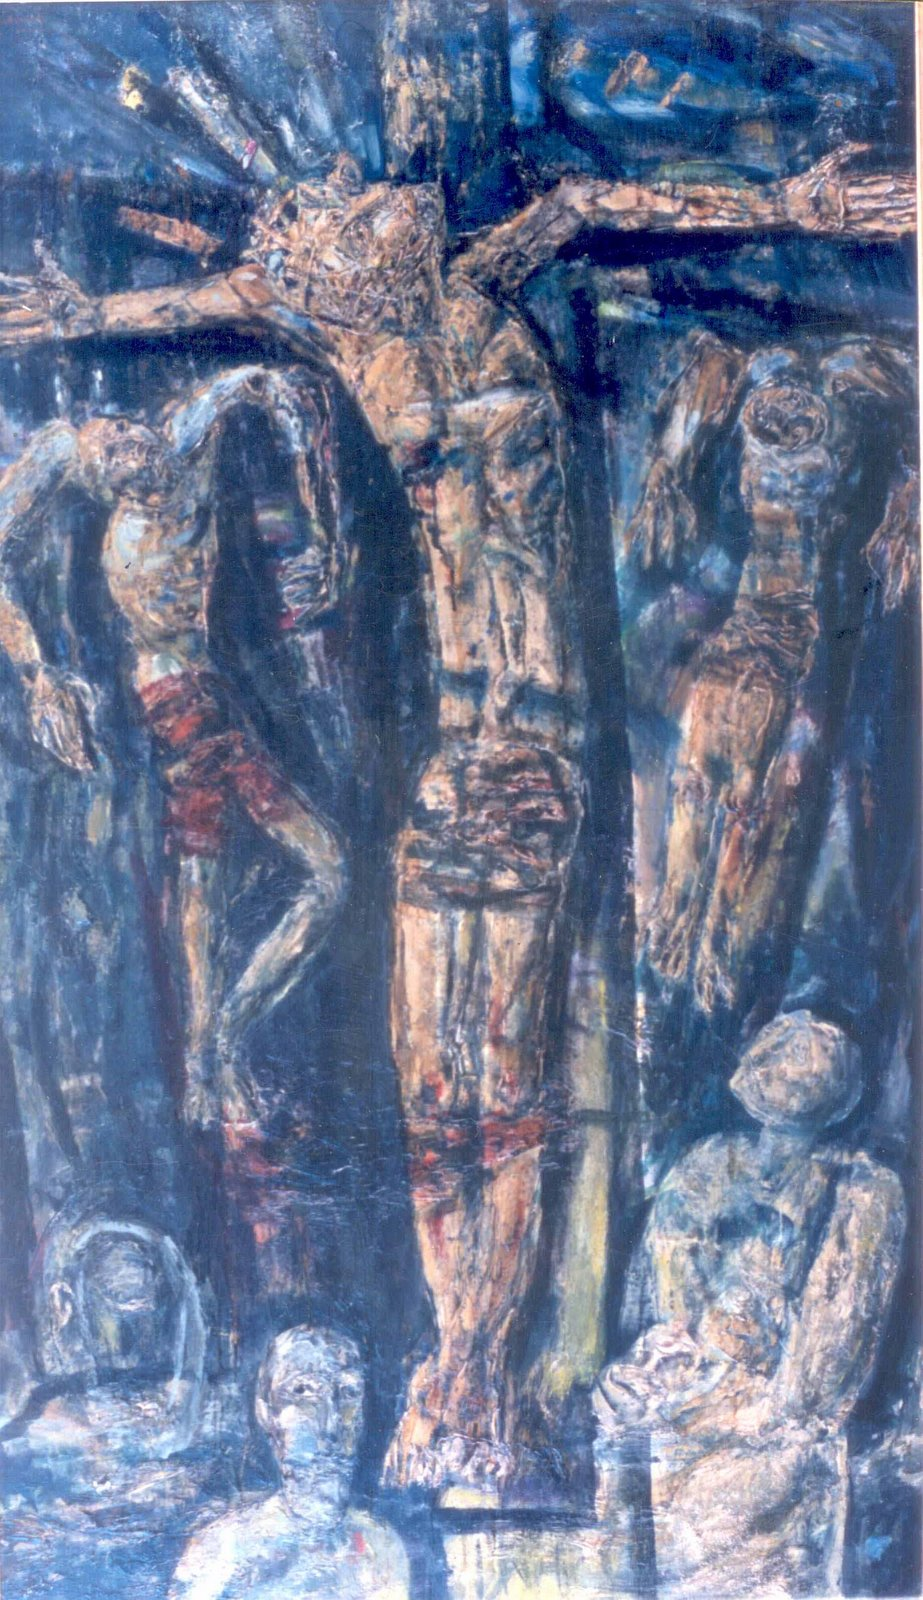 [PRESAS+LEOPOLDO+crucifixion.jpg]